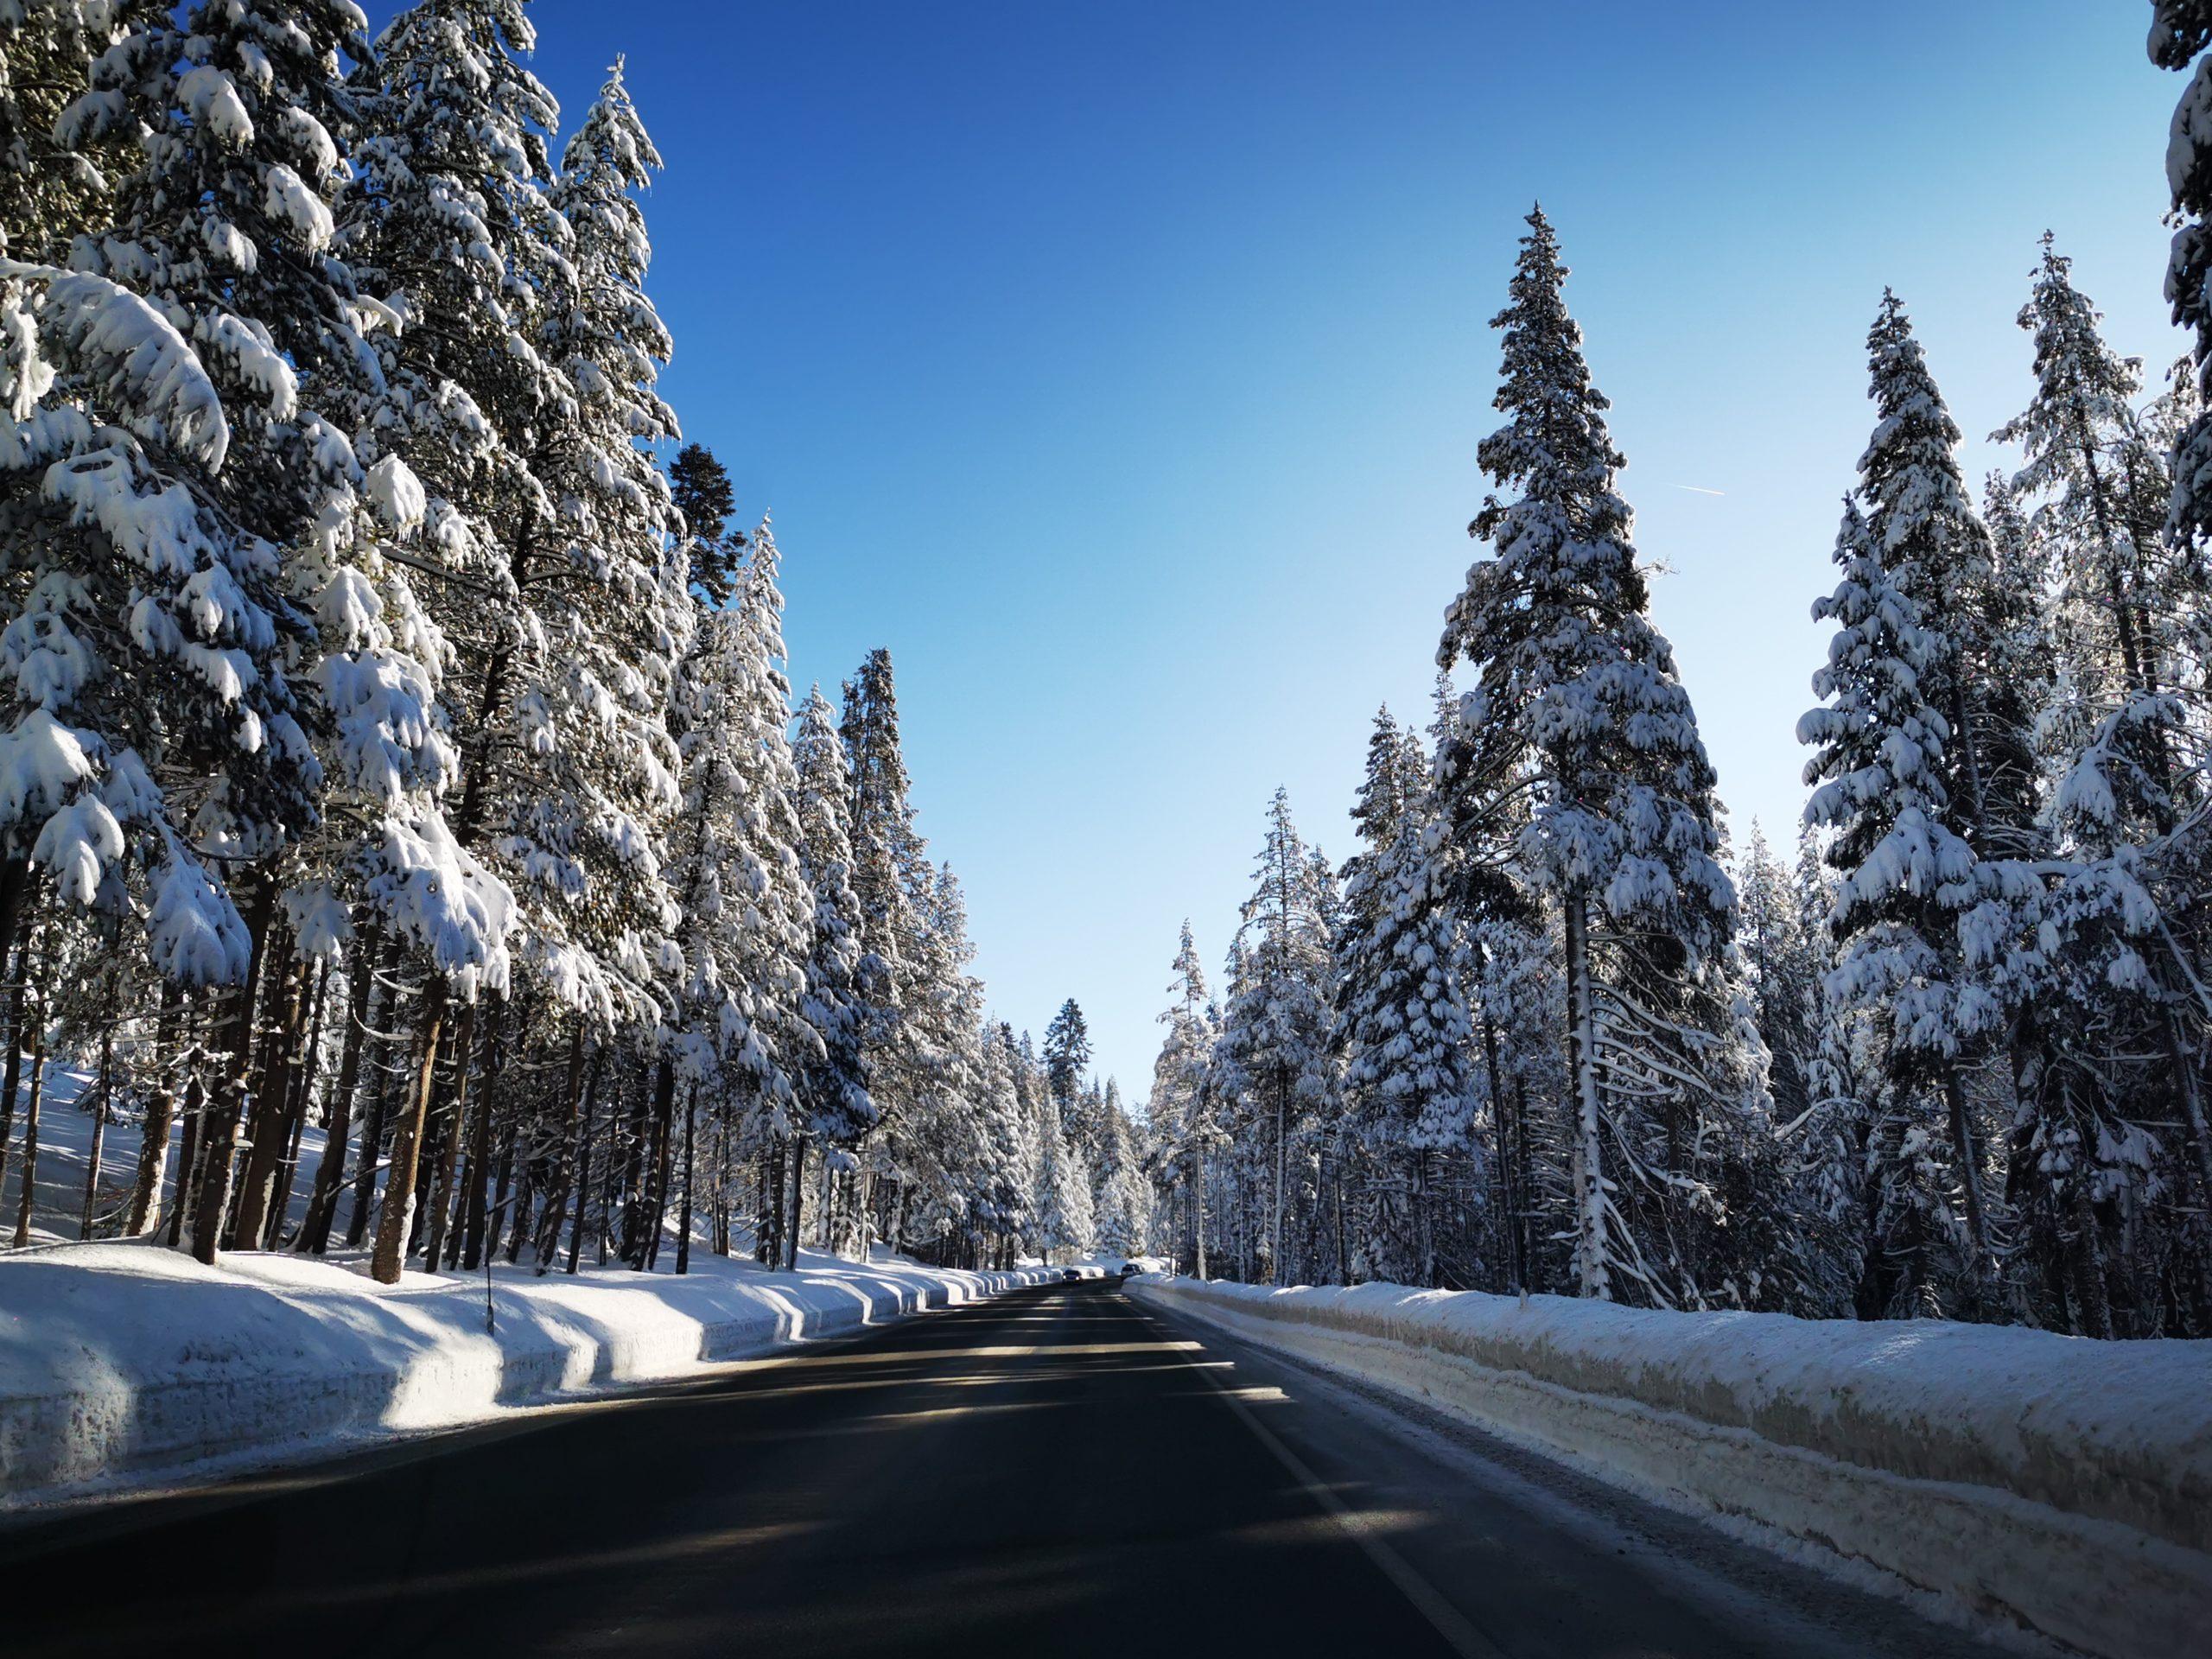 Winter Drive to Lake Tahoe